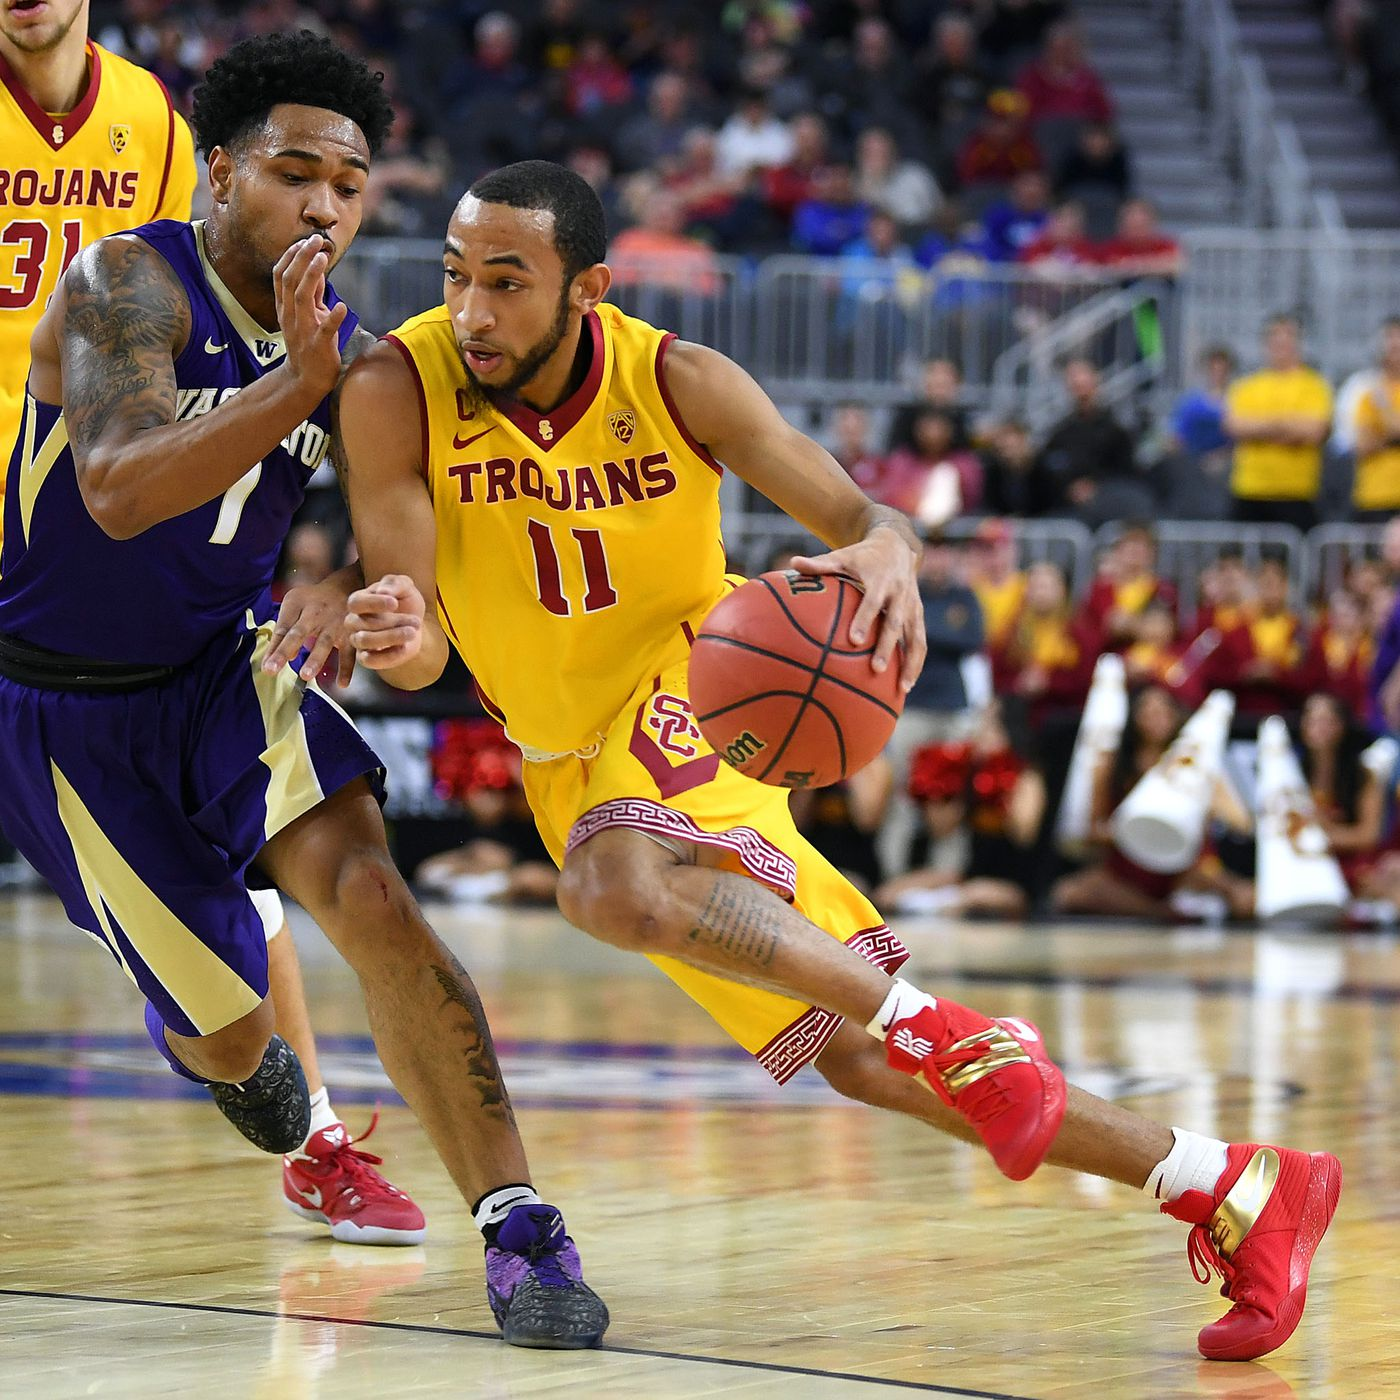 Miseria Repegar Sombra  USC Basketball season in review: Jordan McLaughlin - Conquest ...